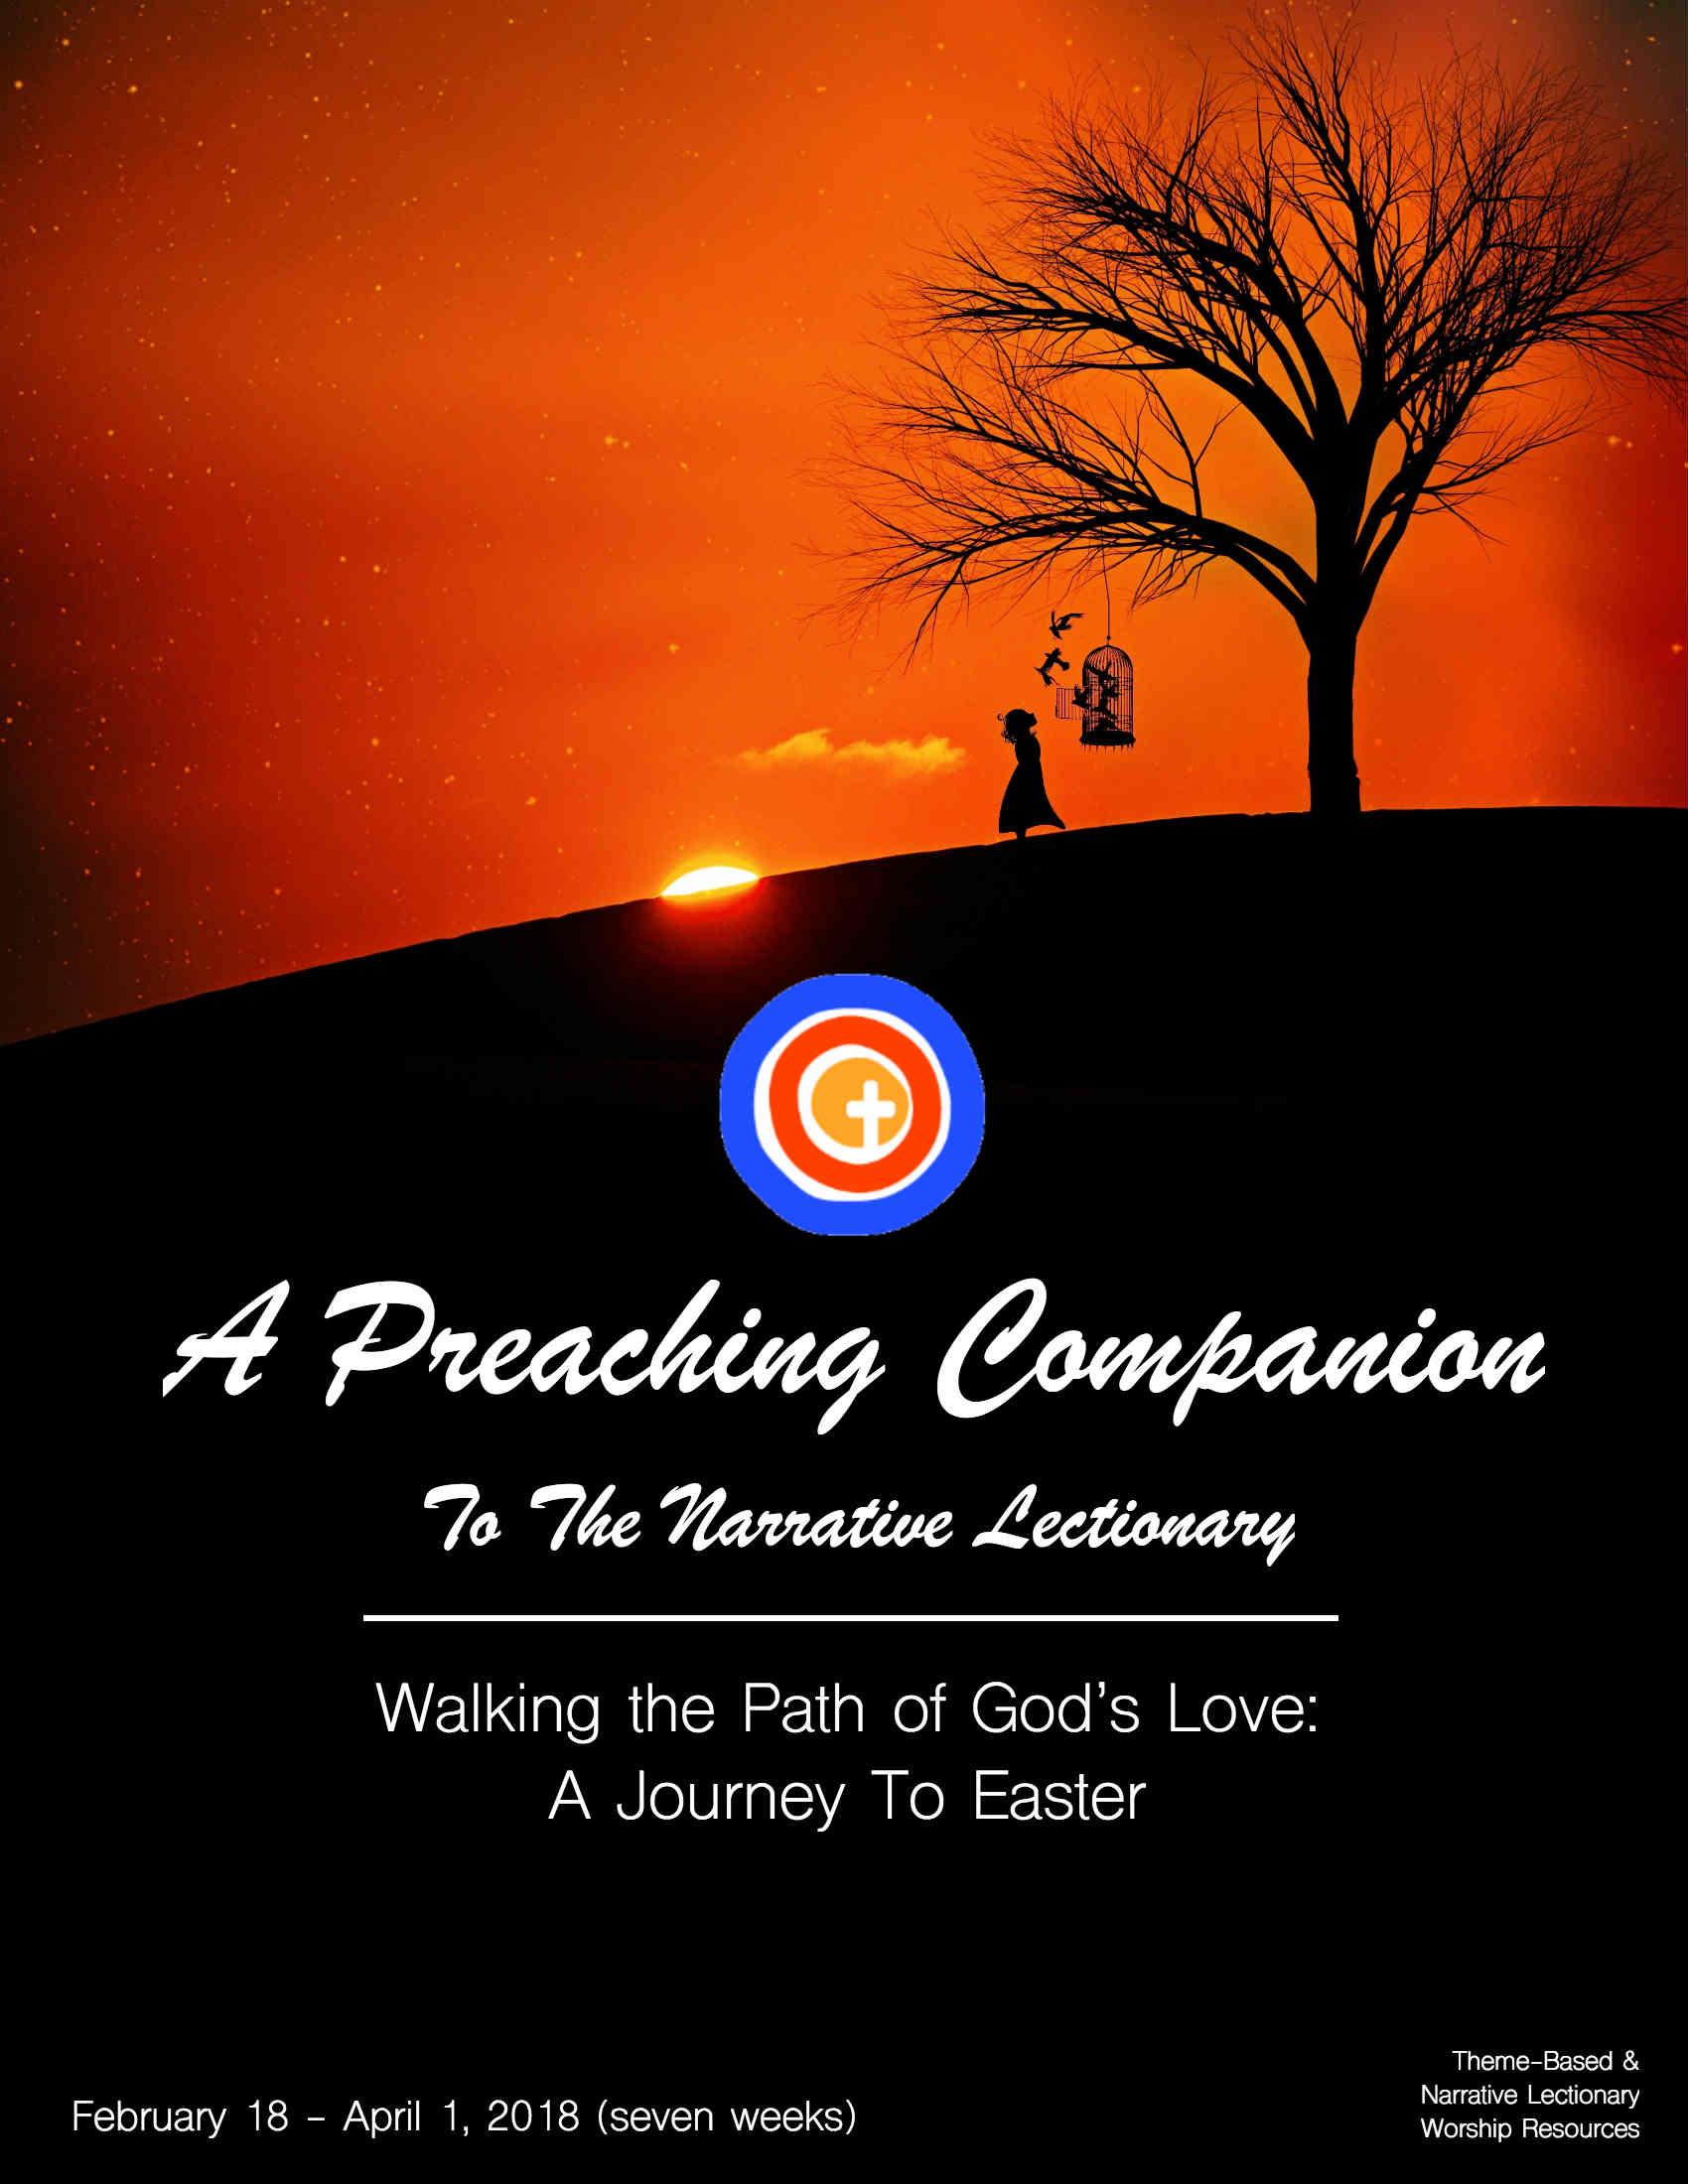 ST 2018-02 Preaching Companion Lent Cover 02.jpg